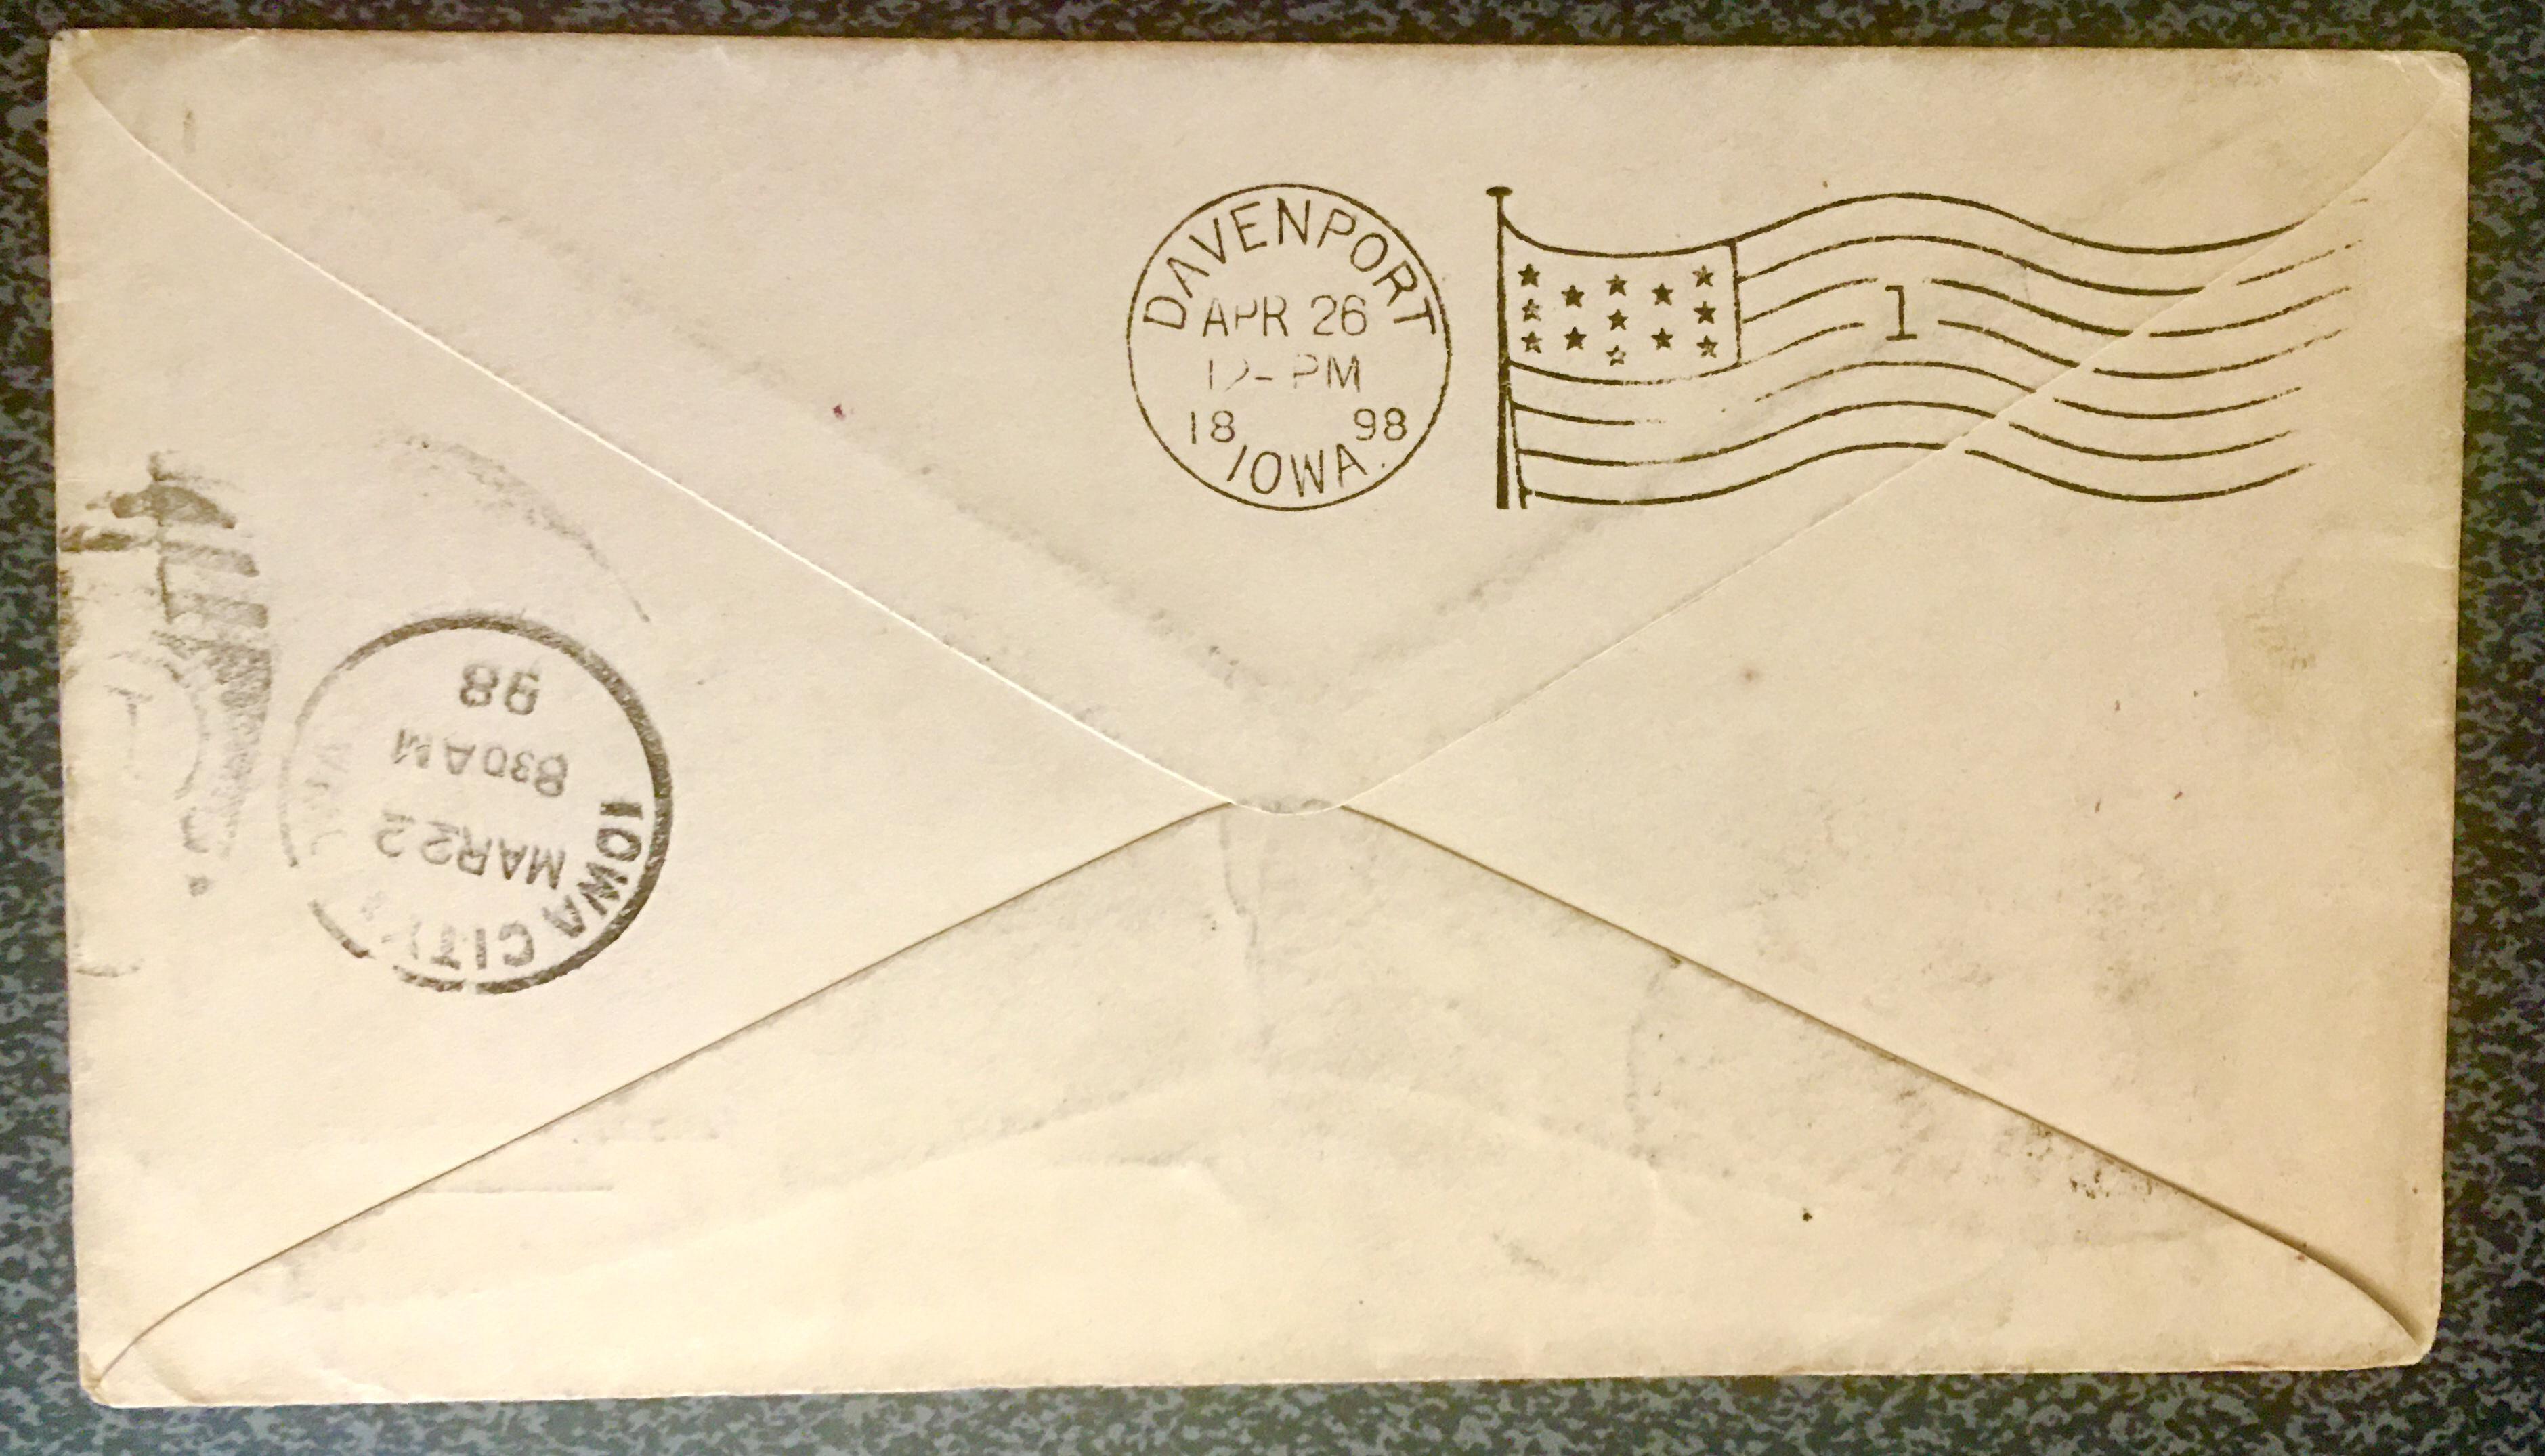 266-267-1898 CR IC DavnptA